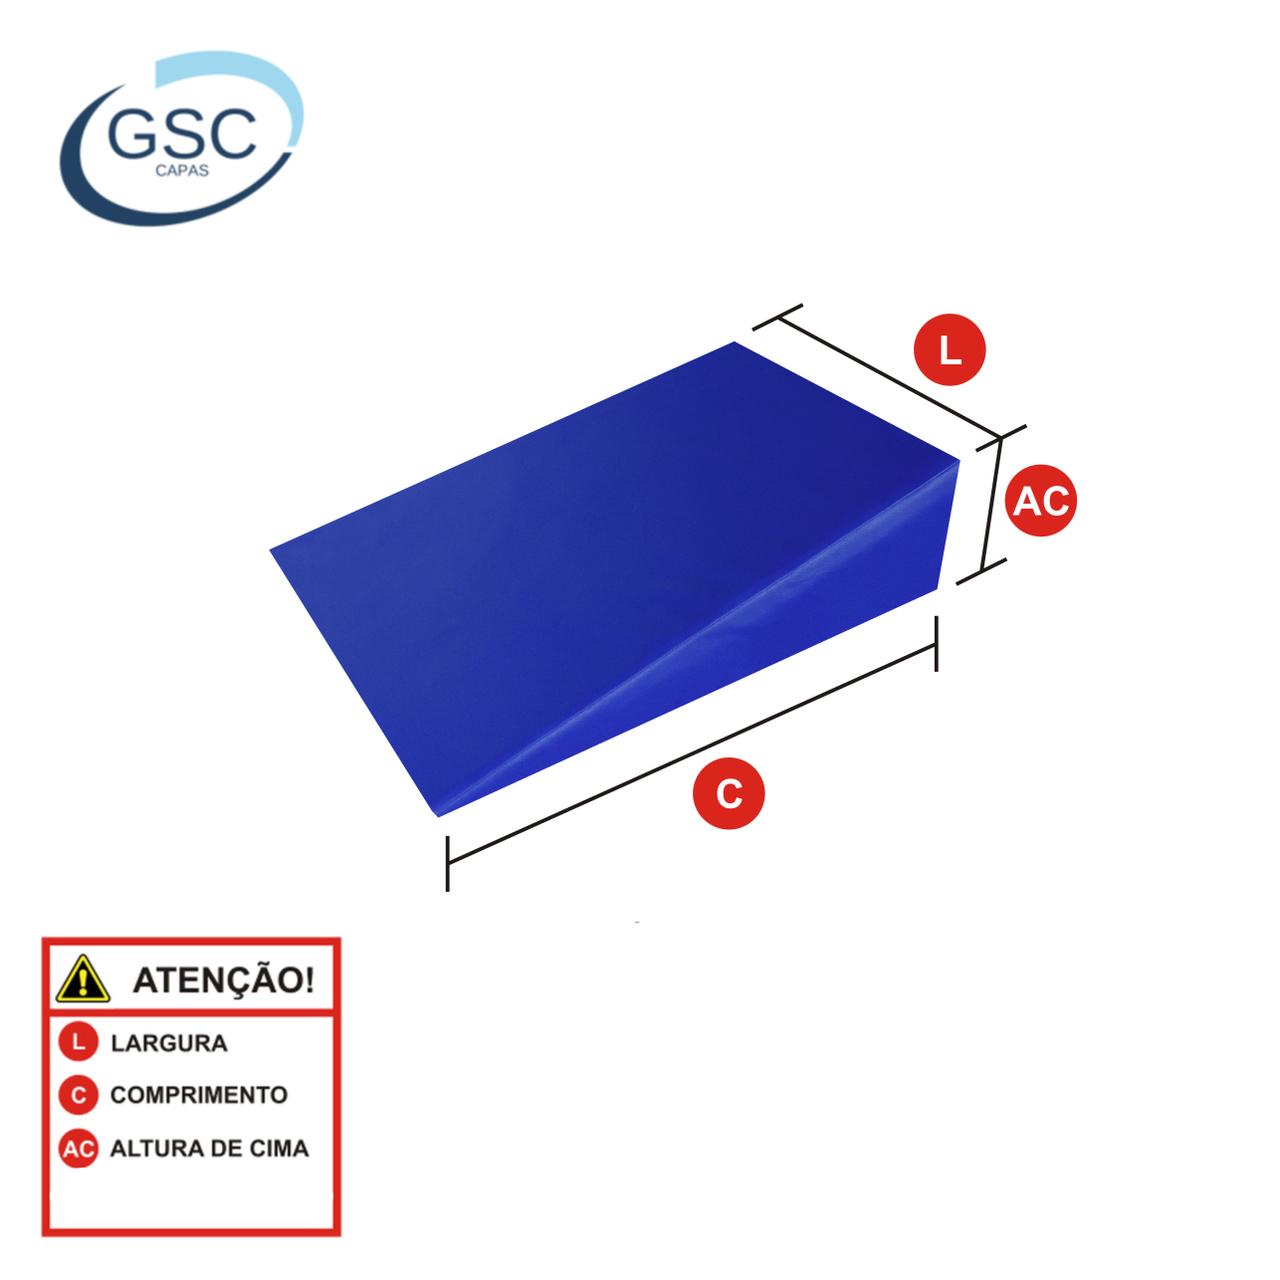 Capa Hospitalar Impermeável Soldada Rampa Travesseiro Anti-Refluxo